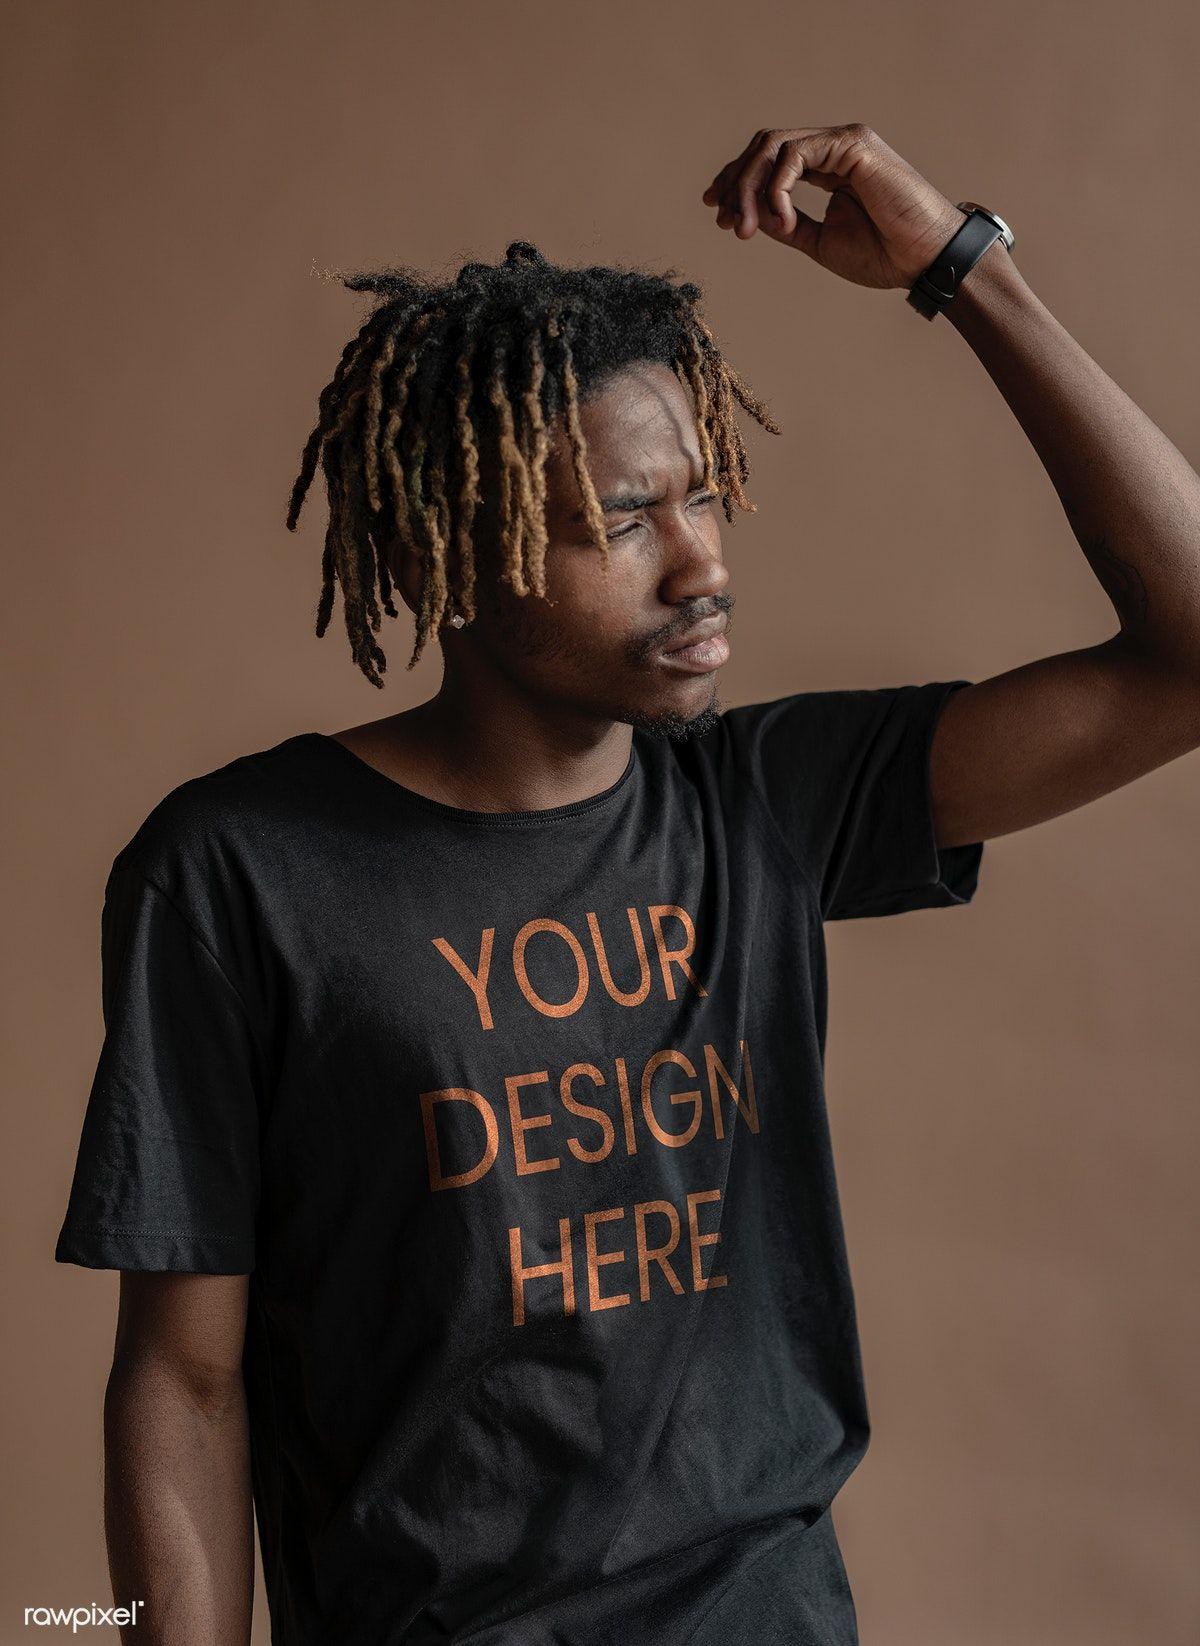 Download Premium Psd Of Black Man Wearing A T Shirt Mockup 1213816 In 2021 Shirt Mockup Black Hoodie Men Tshirt Mockup